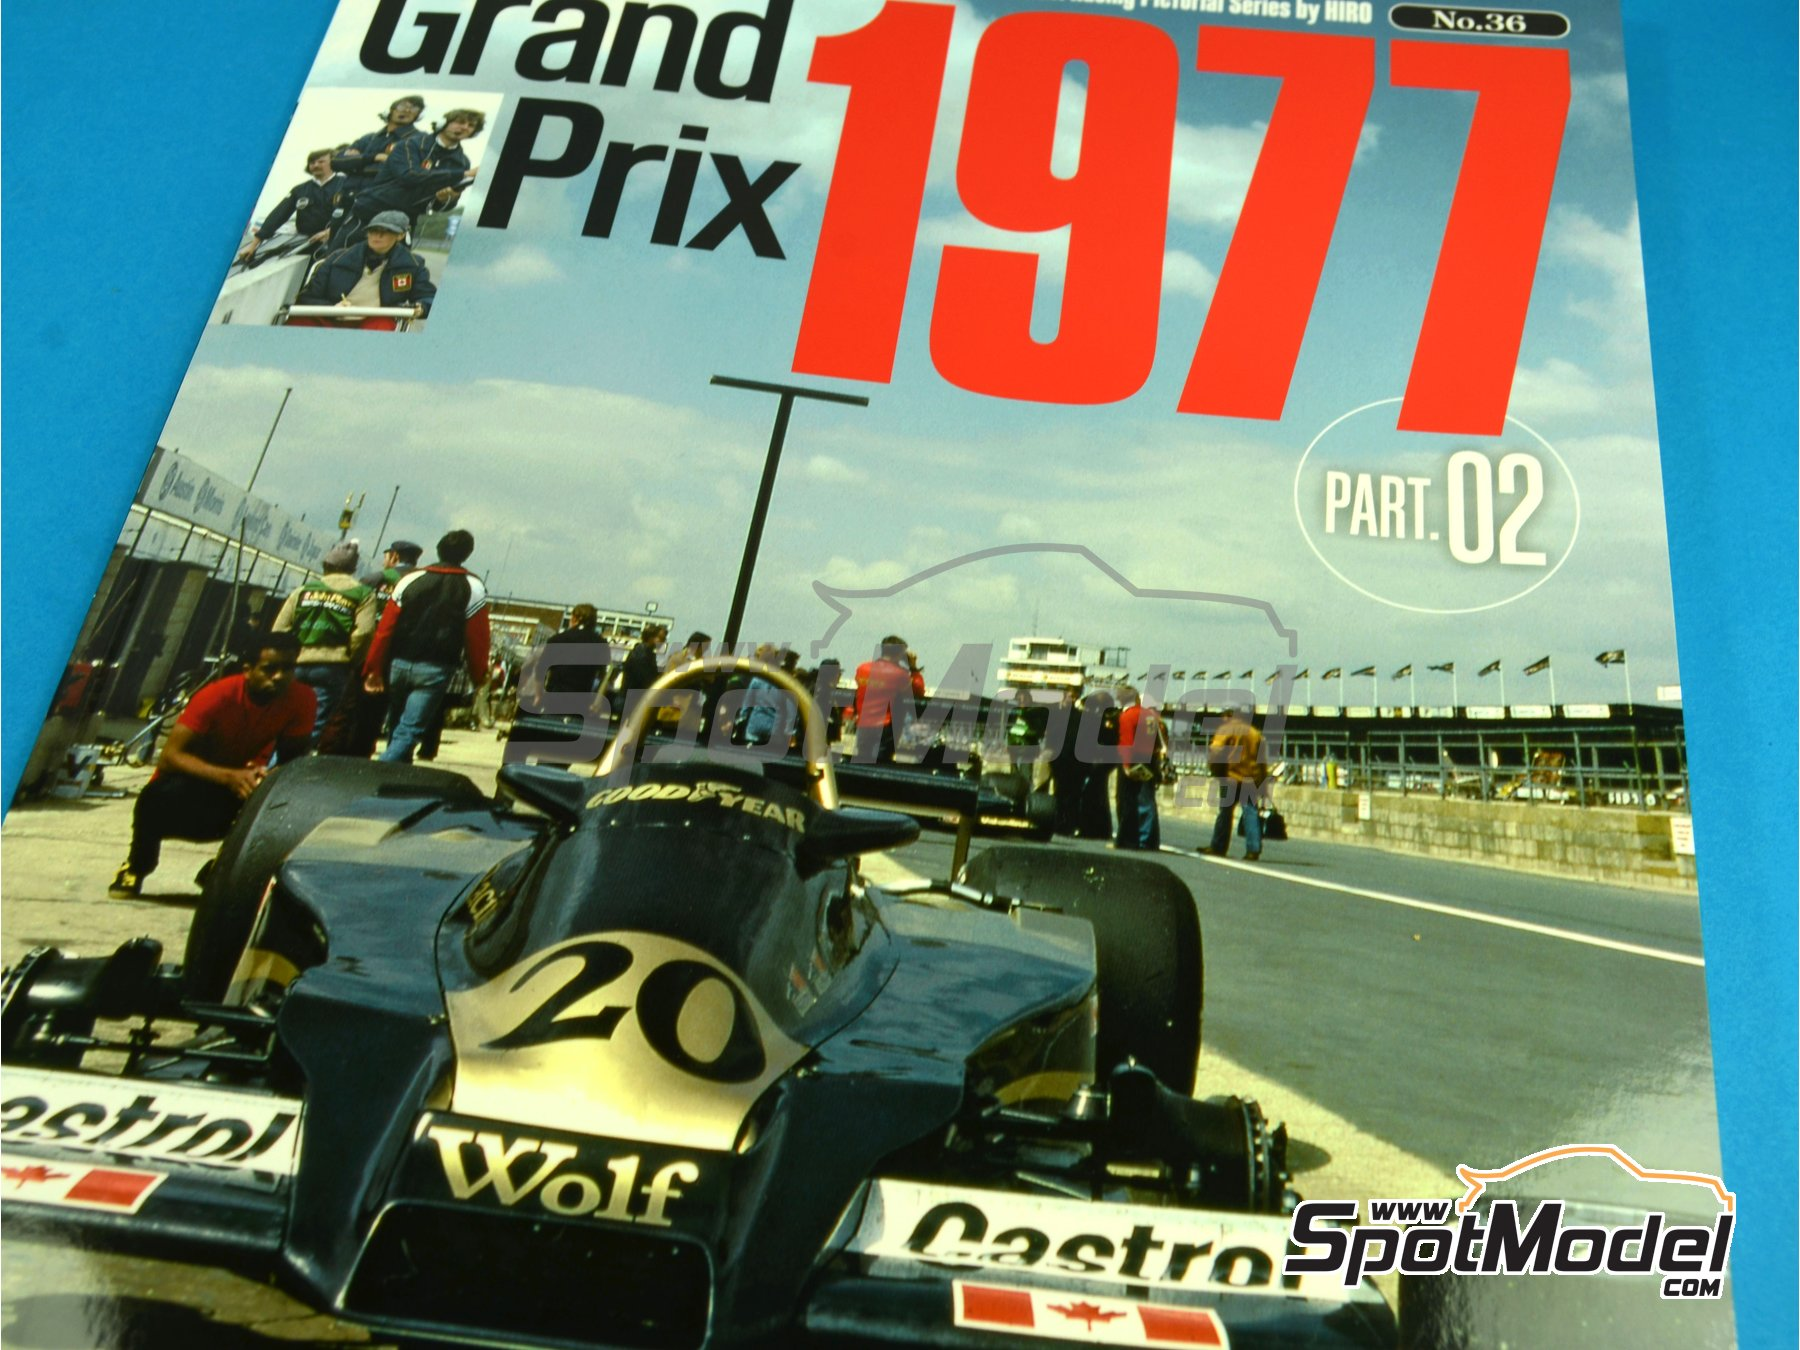 Image 1: JOE HONDA Racing Pictorial Series - Grand Prix 1977, Part 02 | Reference / walkaround book manufactured by Model Factory Hiro (ref.MFH-JH36)